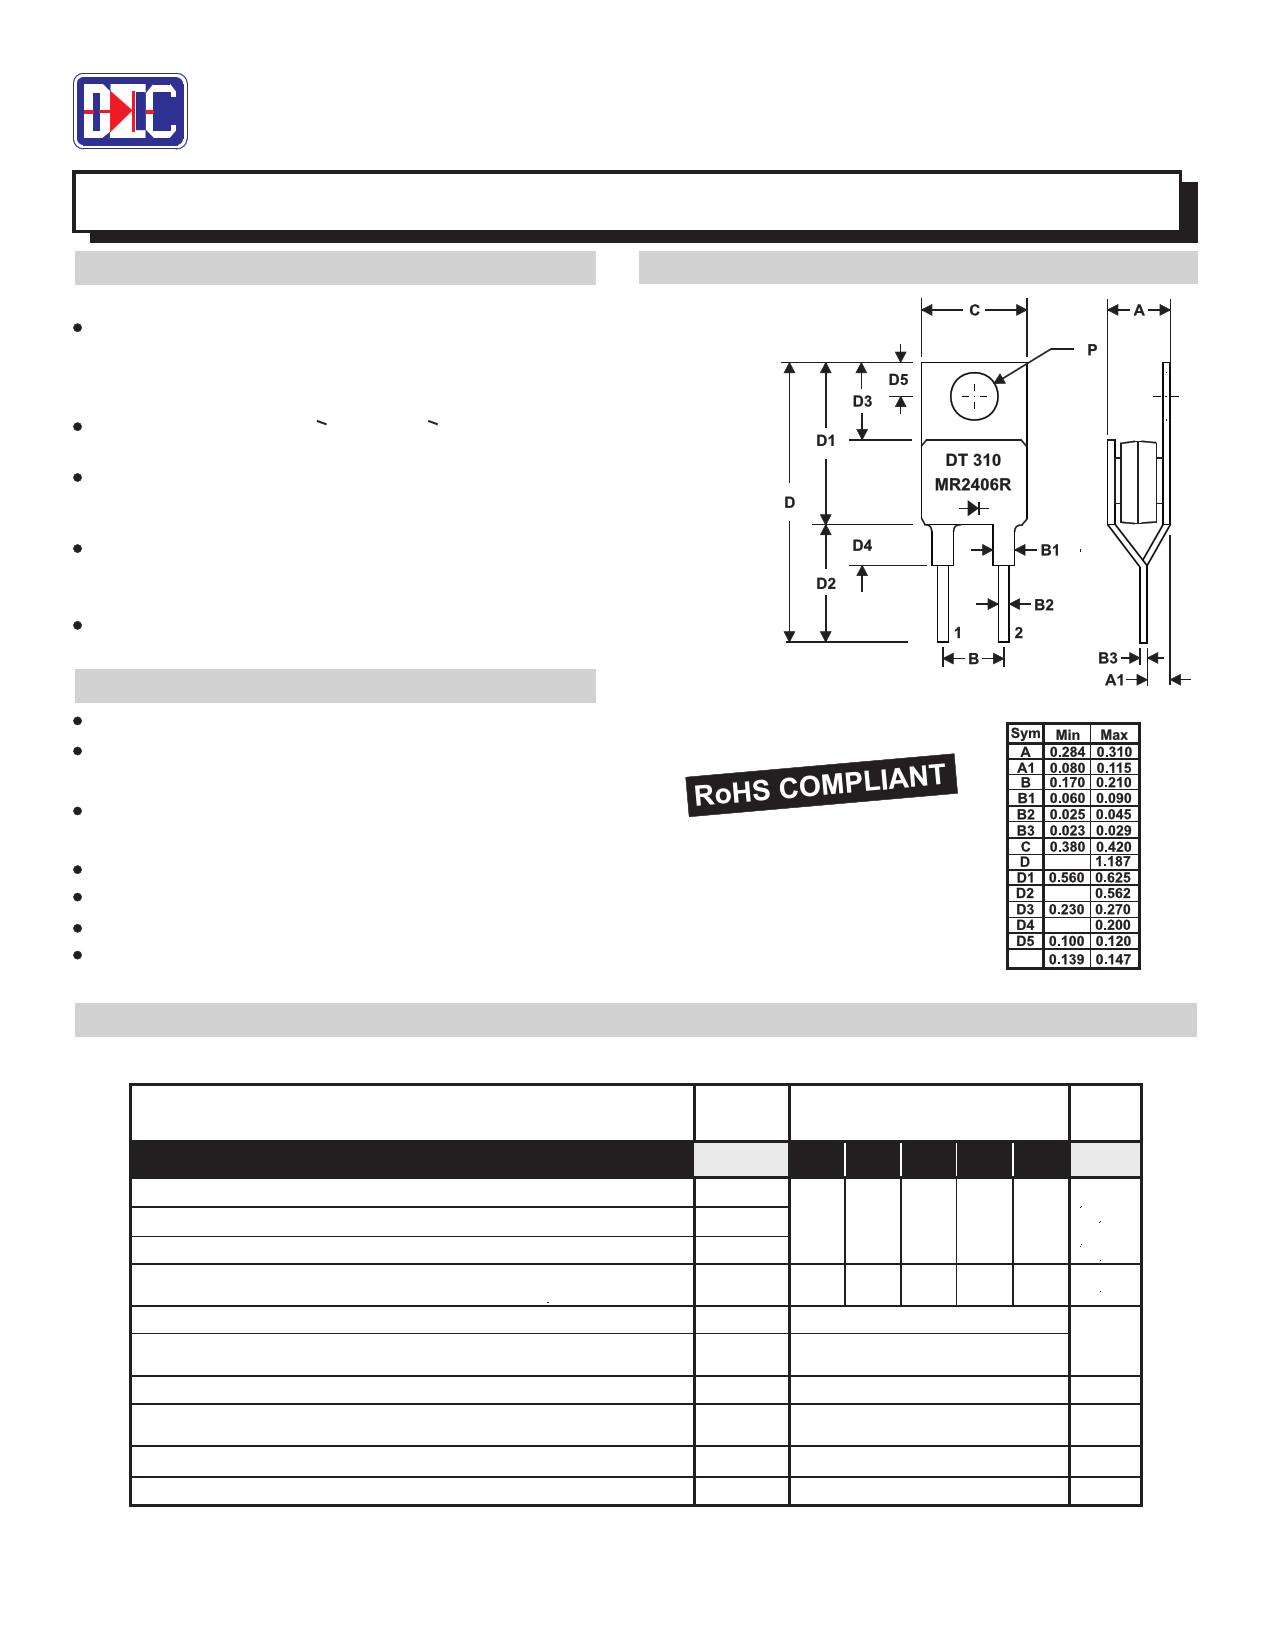 MR2406R 데이터시트 및 MR2406R PDF